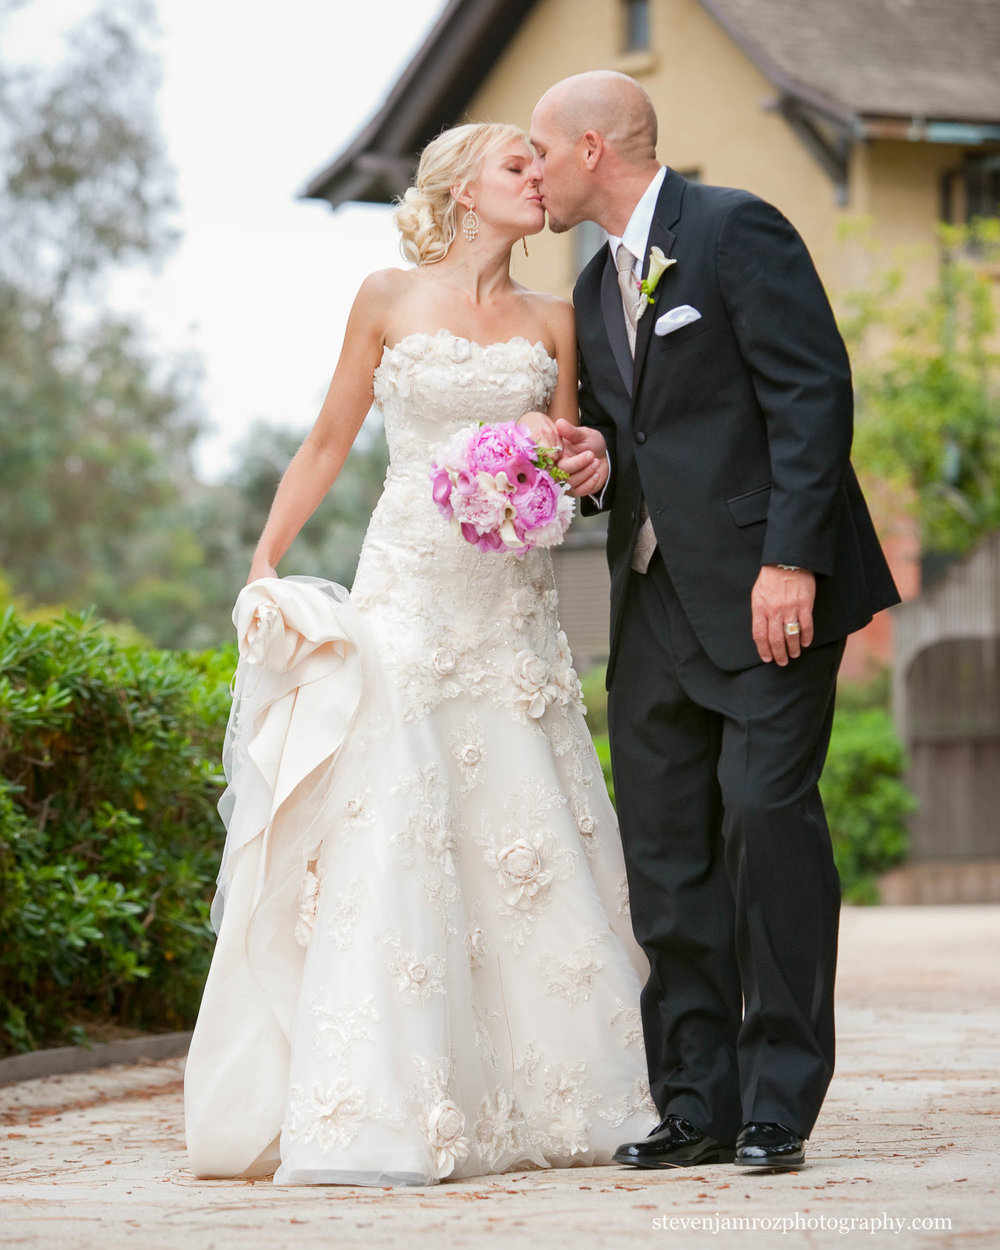 very-pretty-bride-wedding-raleigh-nc-steven-jamroz-photography-0033.jpg